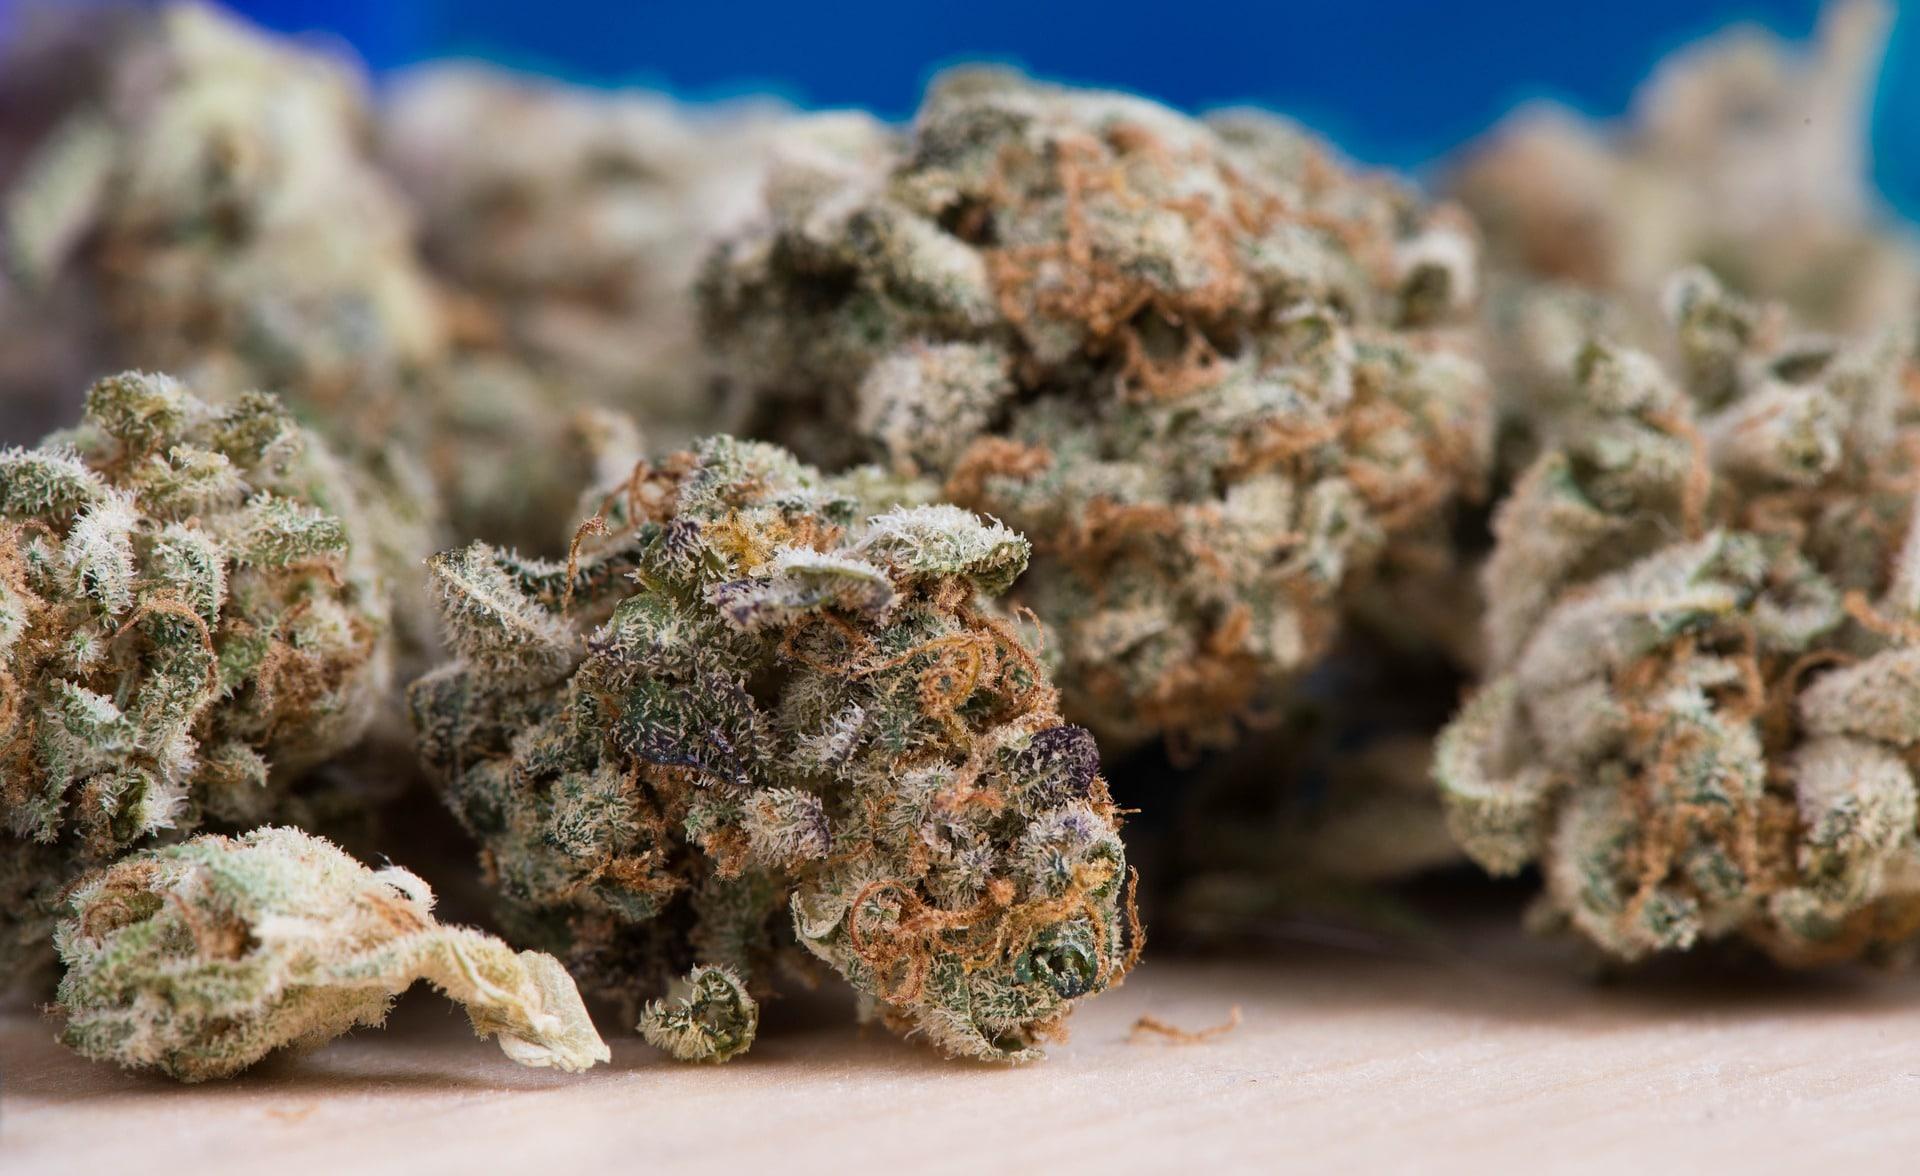 Texas house votes to decriminalize marijuana